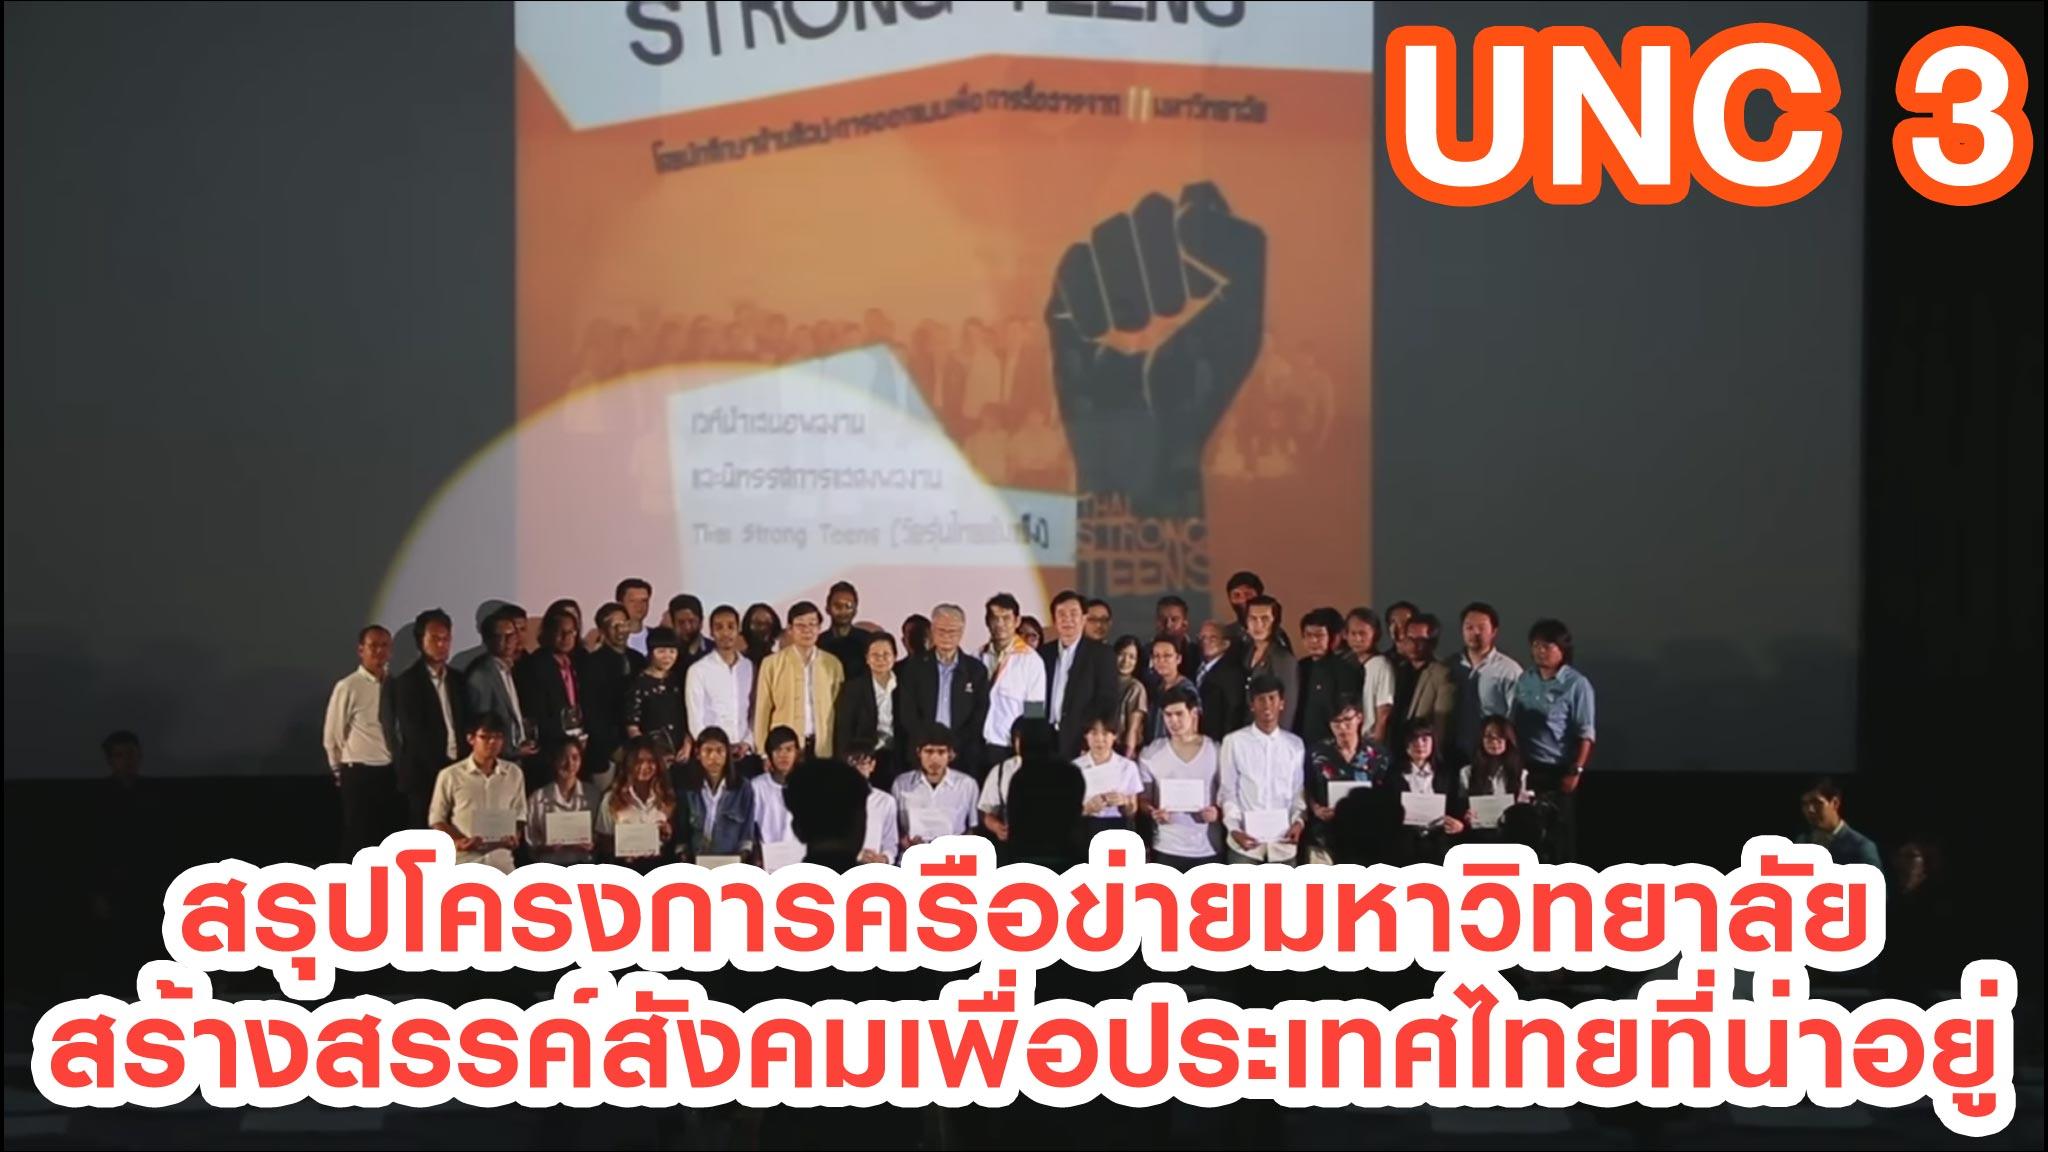 UNC ปี3 สรุปโครงการเครือข่ายมหาวิทยาลัยสร้างสรรค์สังคมเพื่อประเทศไทยที่น่าอยู่